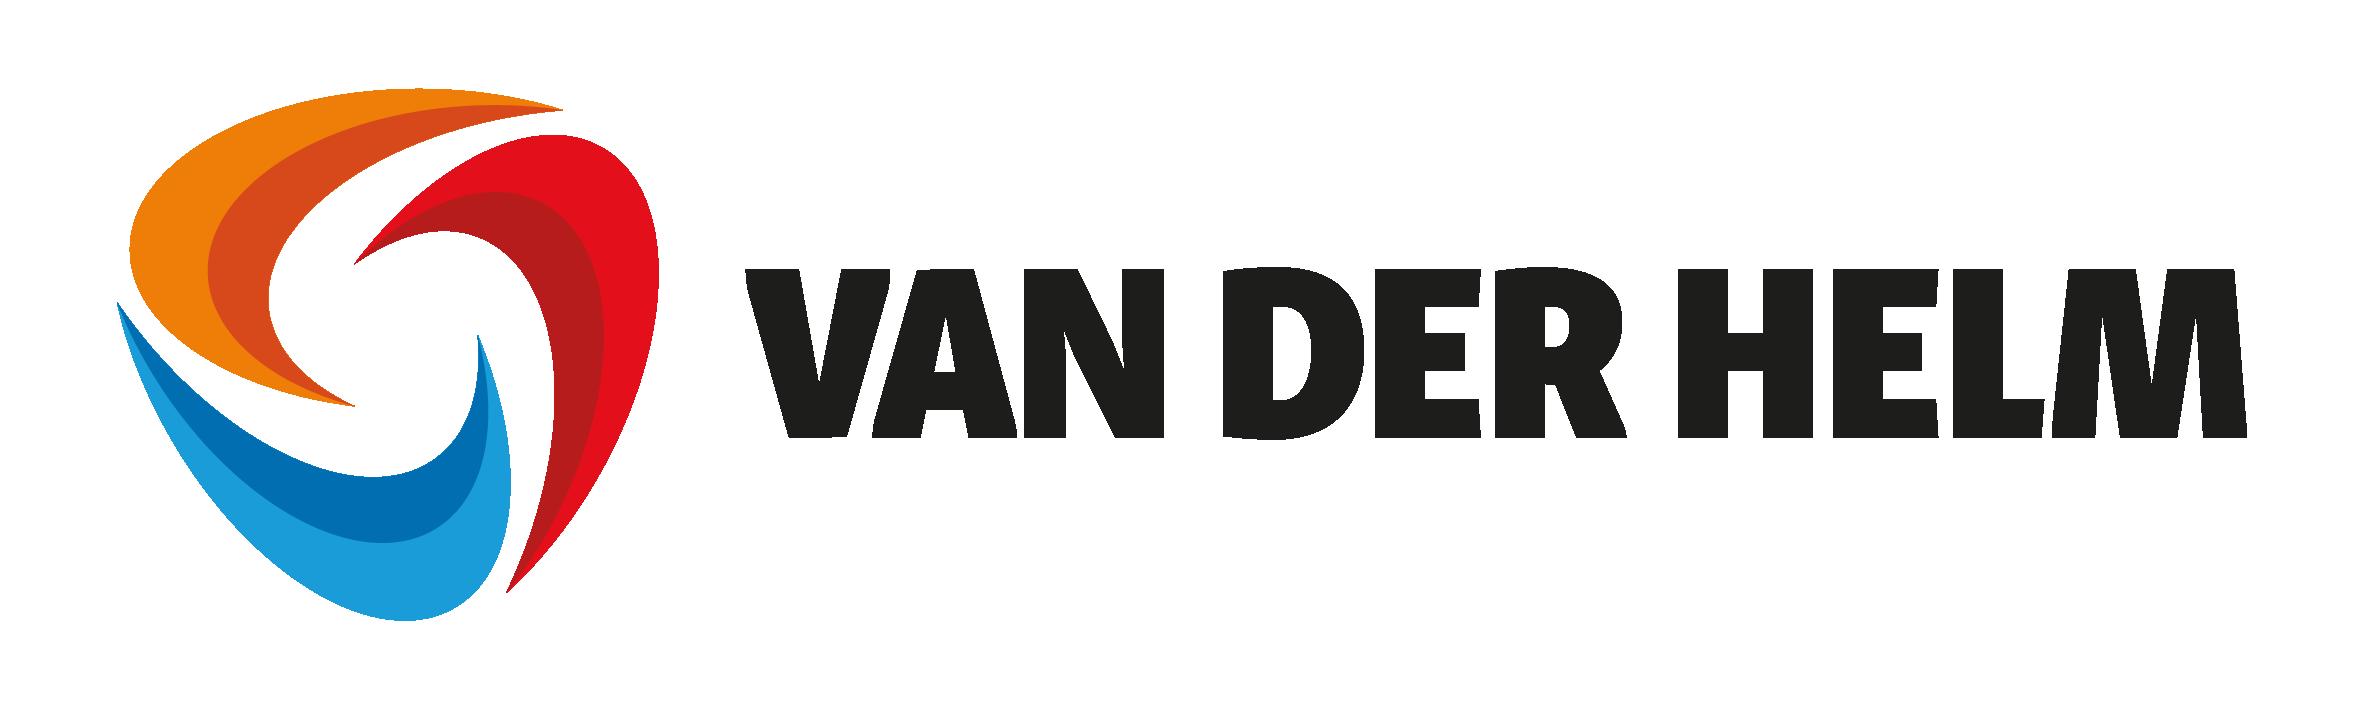 Van der Helm-Hudig